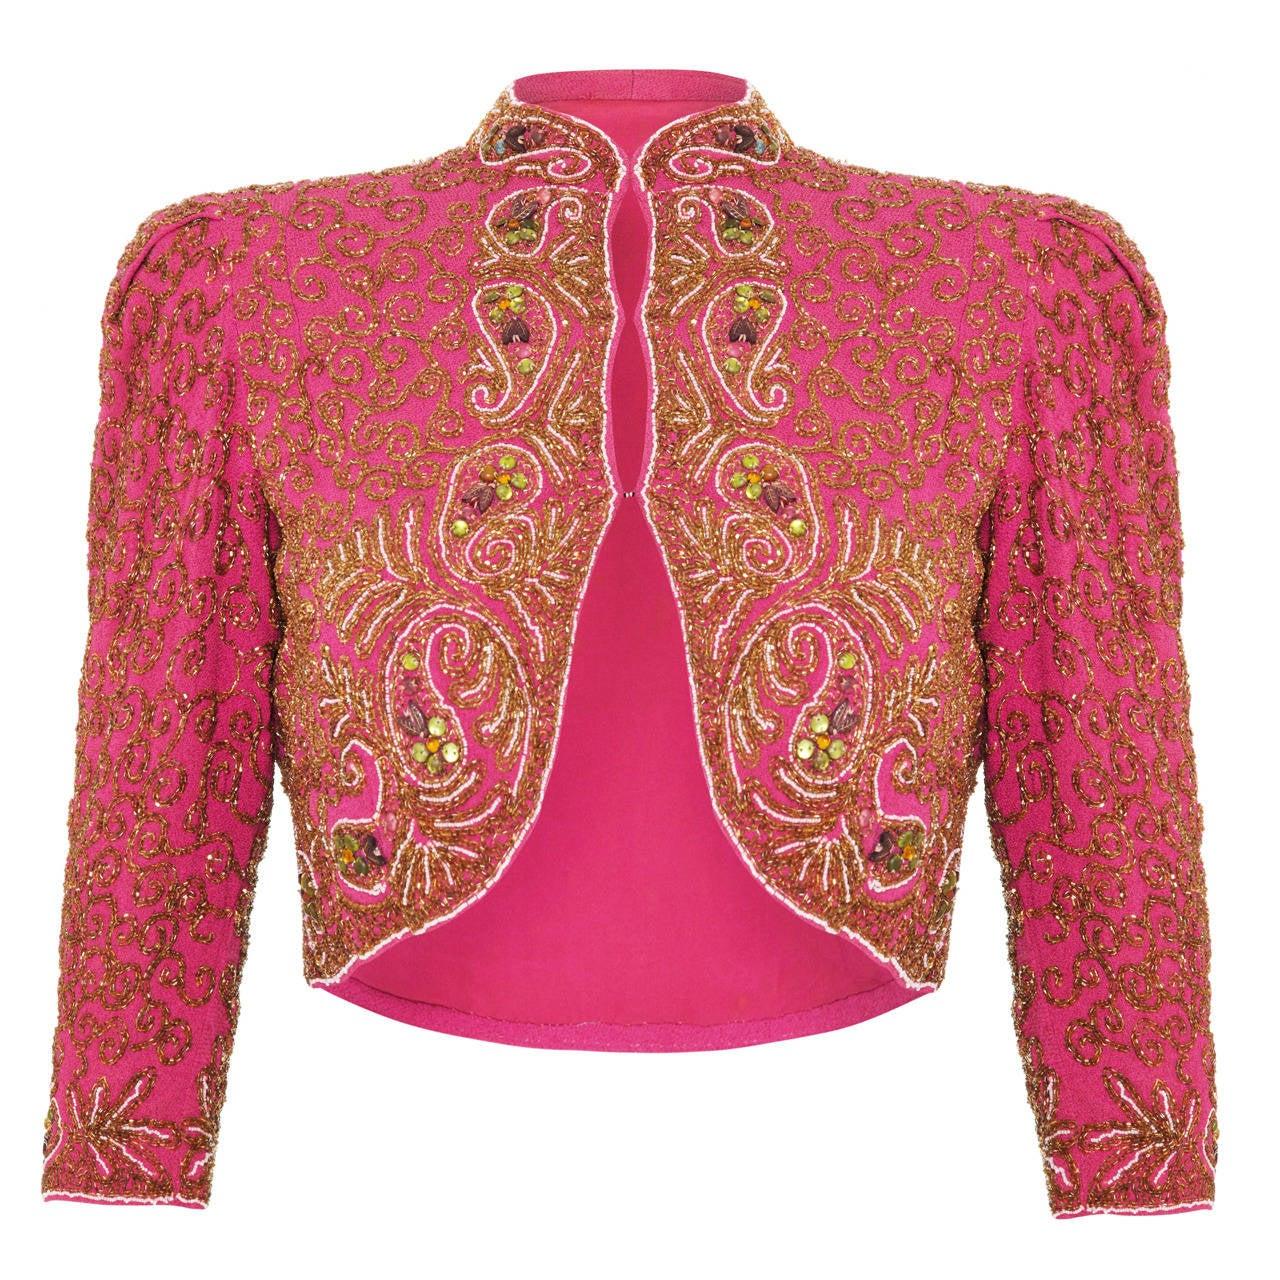 Spectacular 1930s Pink Silk Beaded Bolero Jacket 1